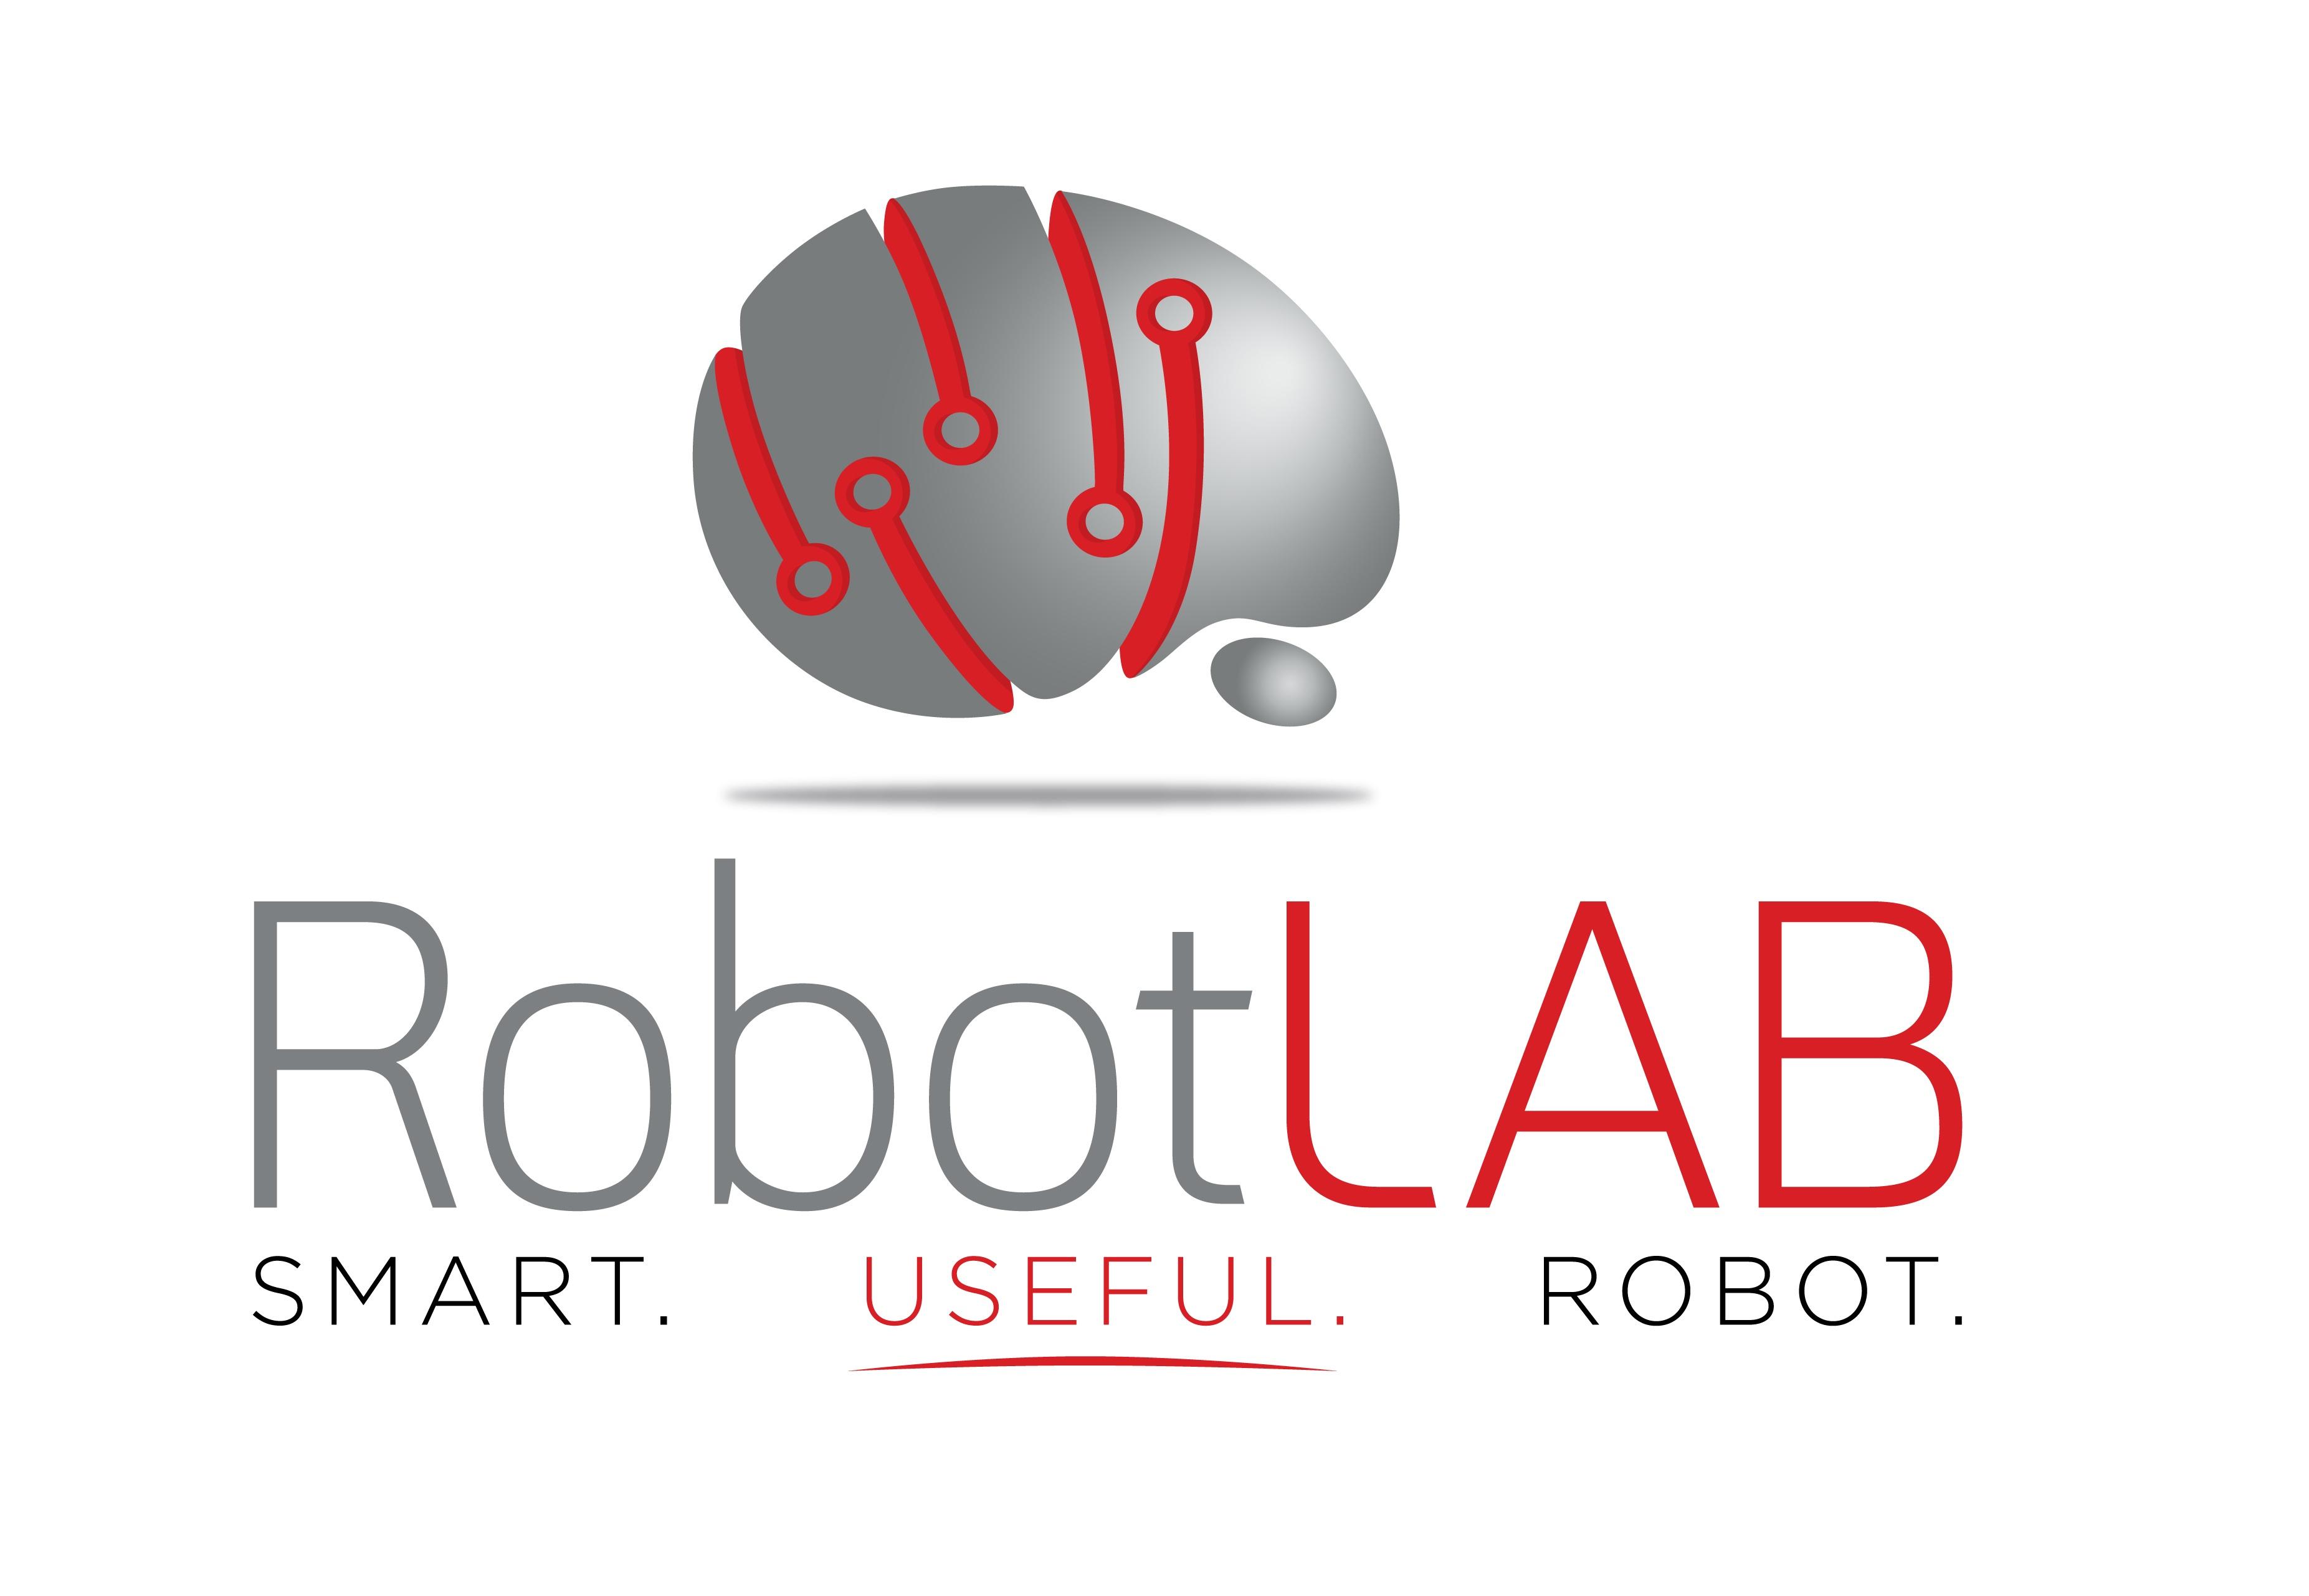 ROBOTLAB-RED-LOGO-01